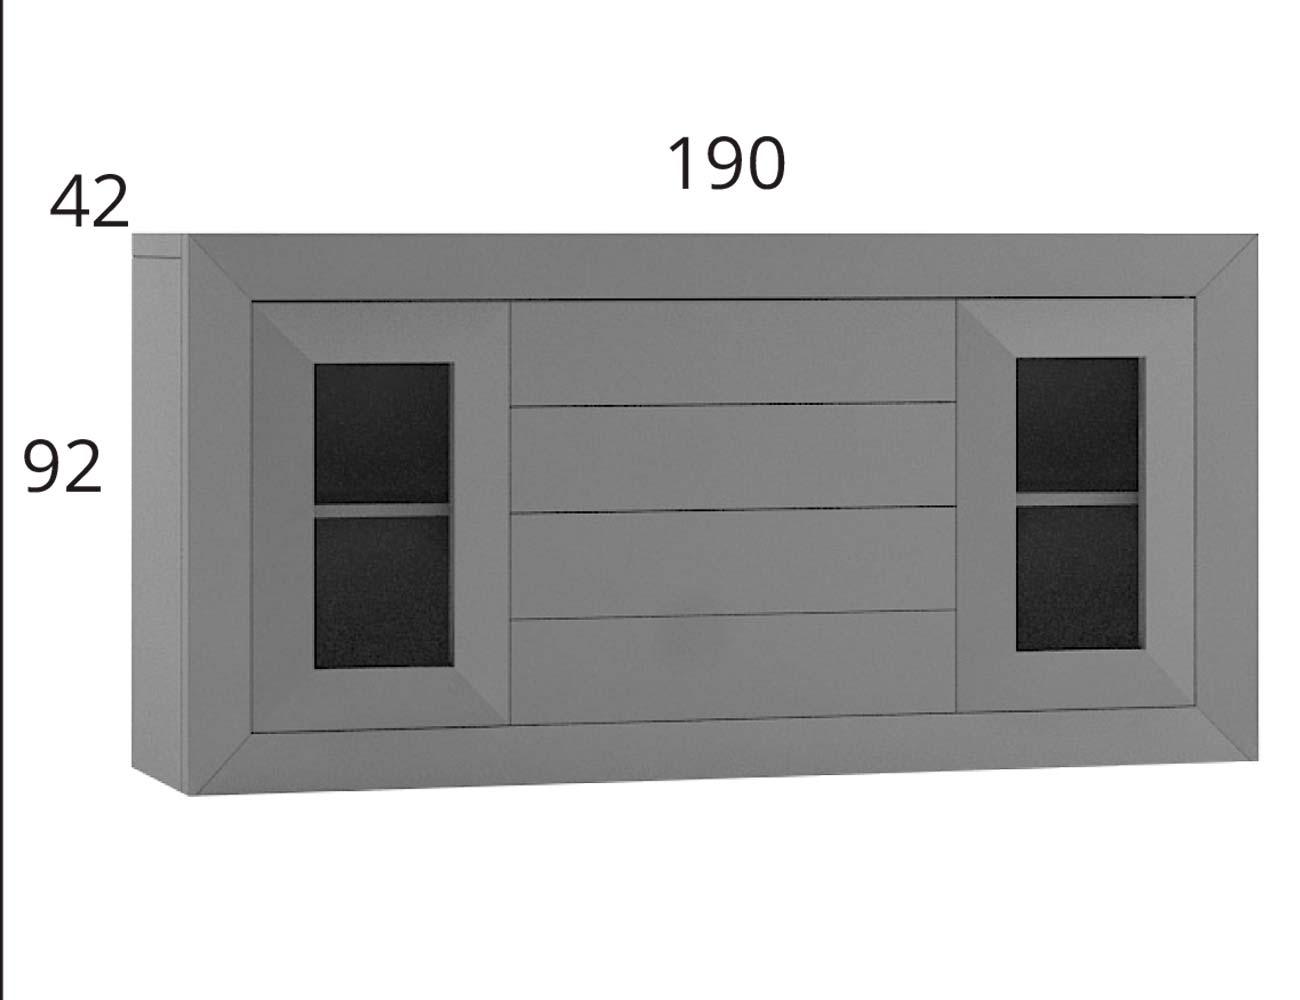 A0321